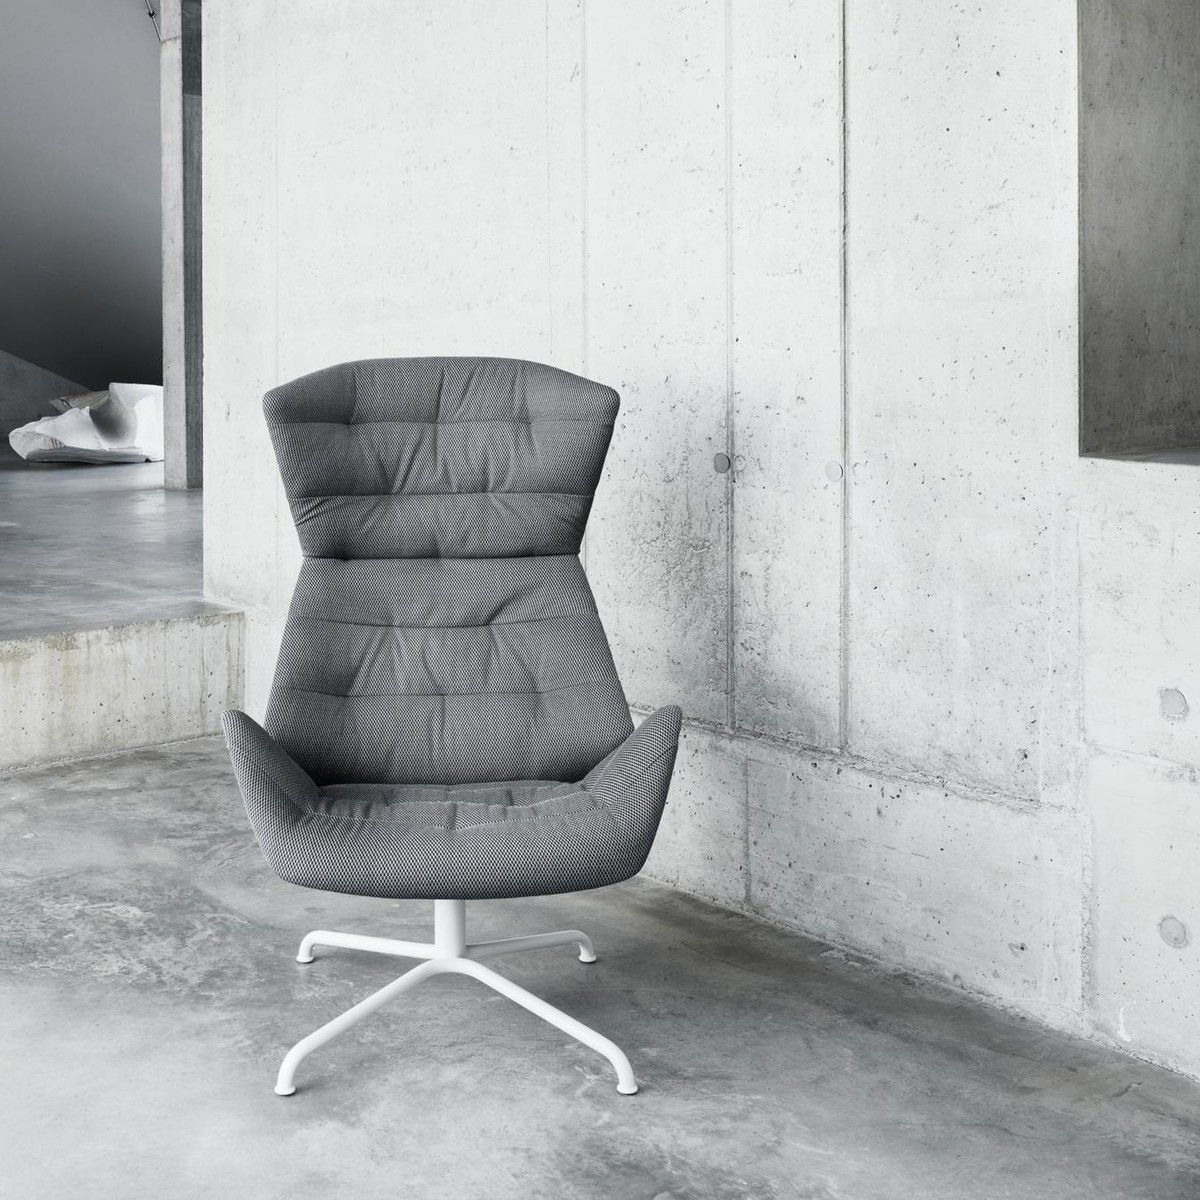 Thonet Lounge Chair 808 Thonet Ambientedirect Com